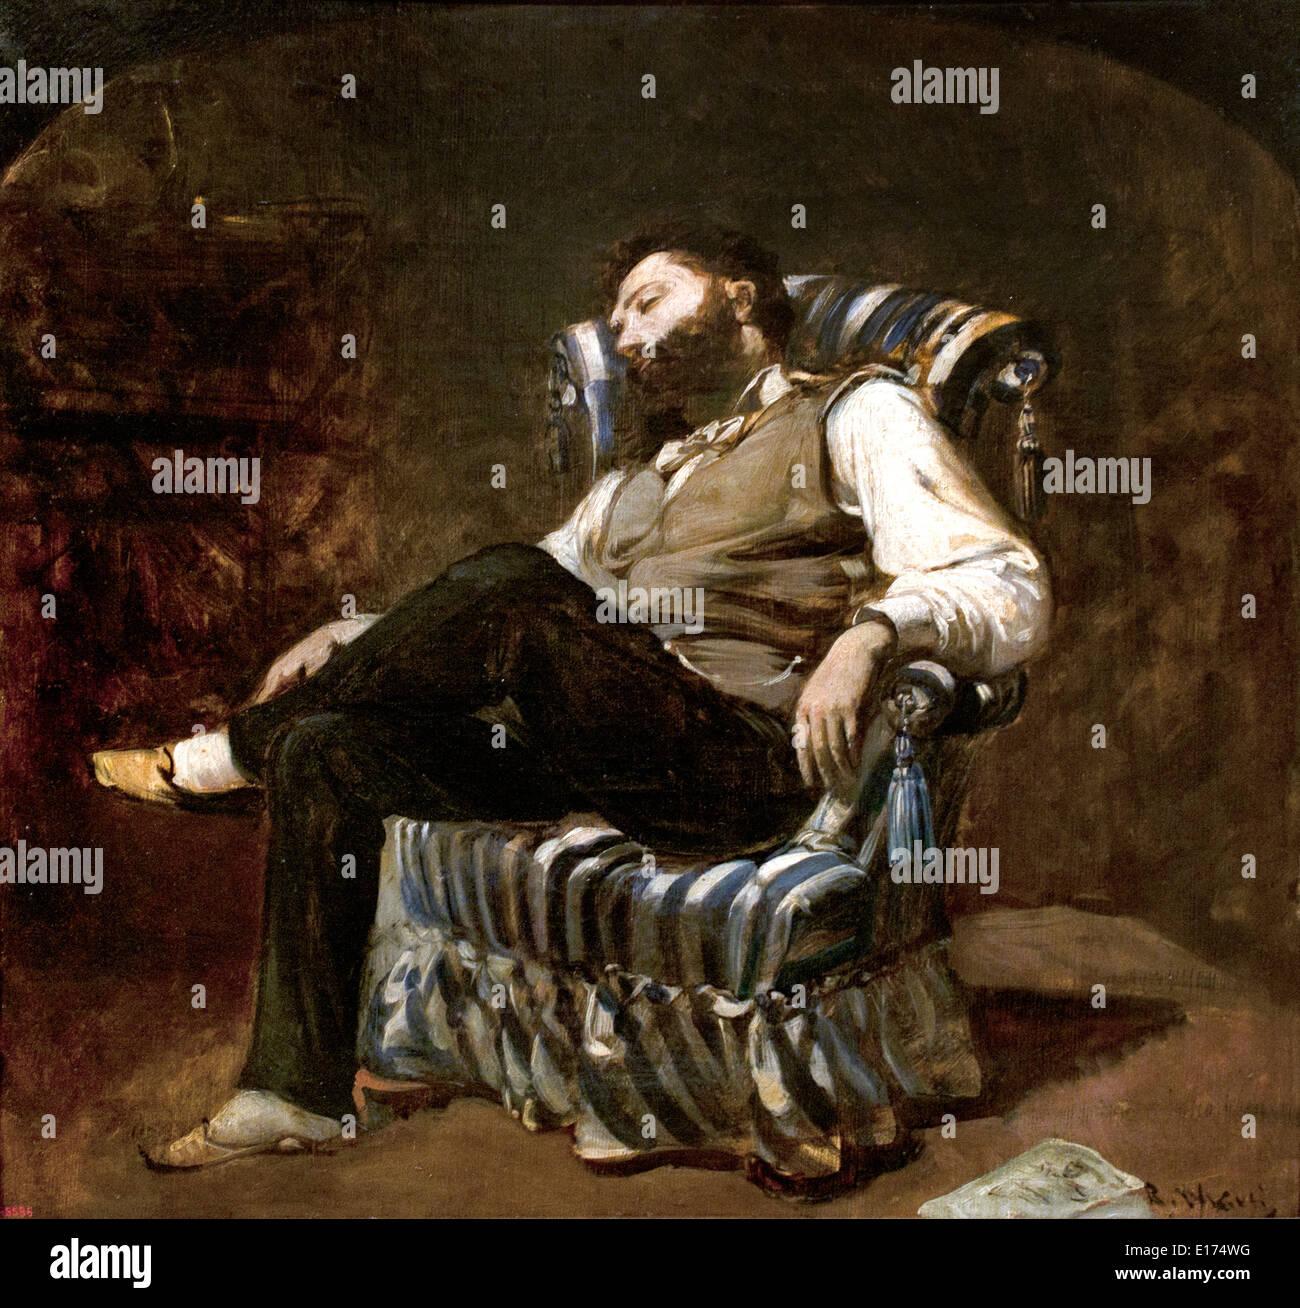 The Siesta 1884 Ramon Martí i Alsina 1826-1894 Spain Spanish - Stock Image